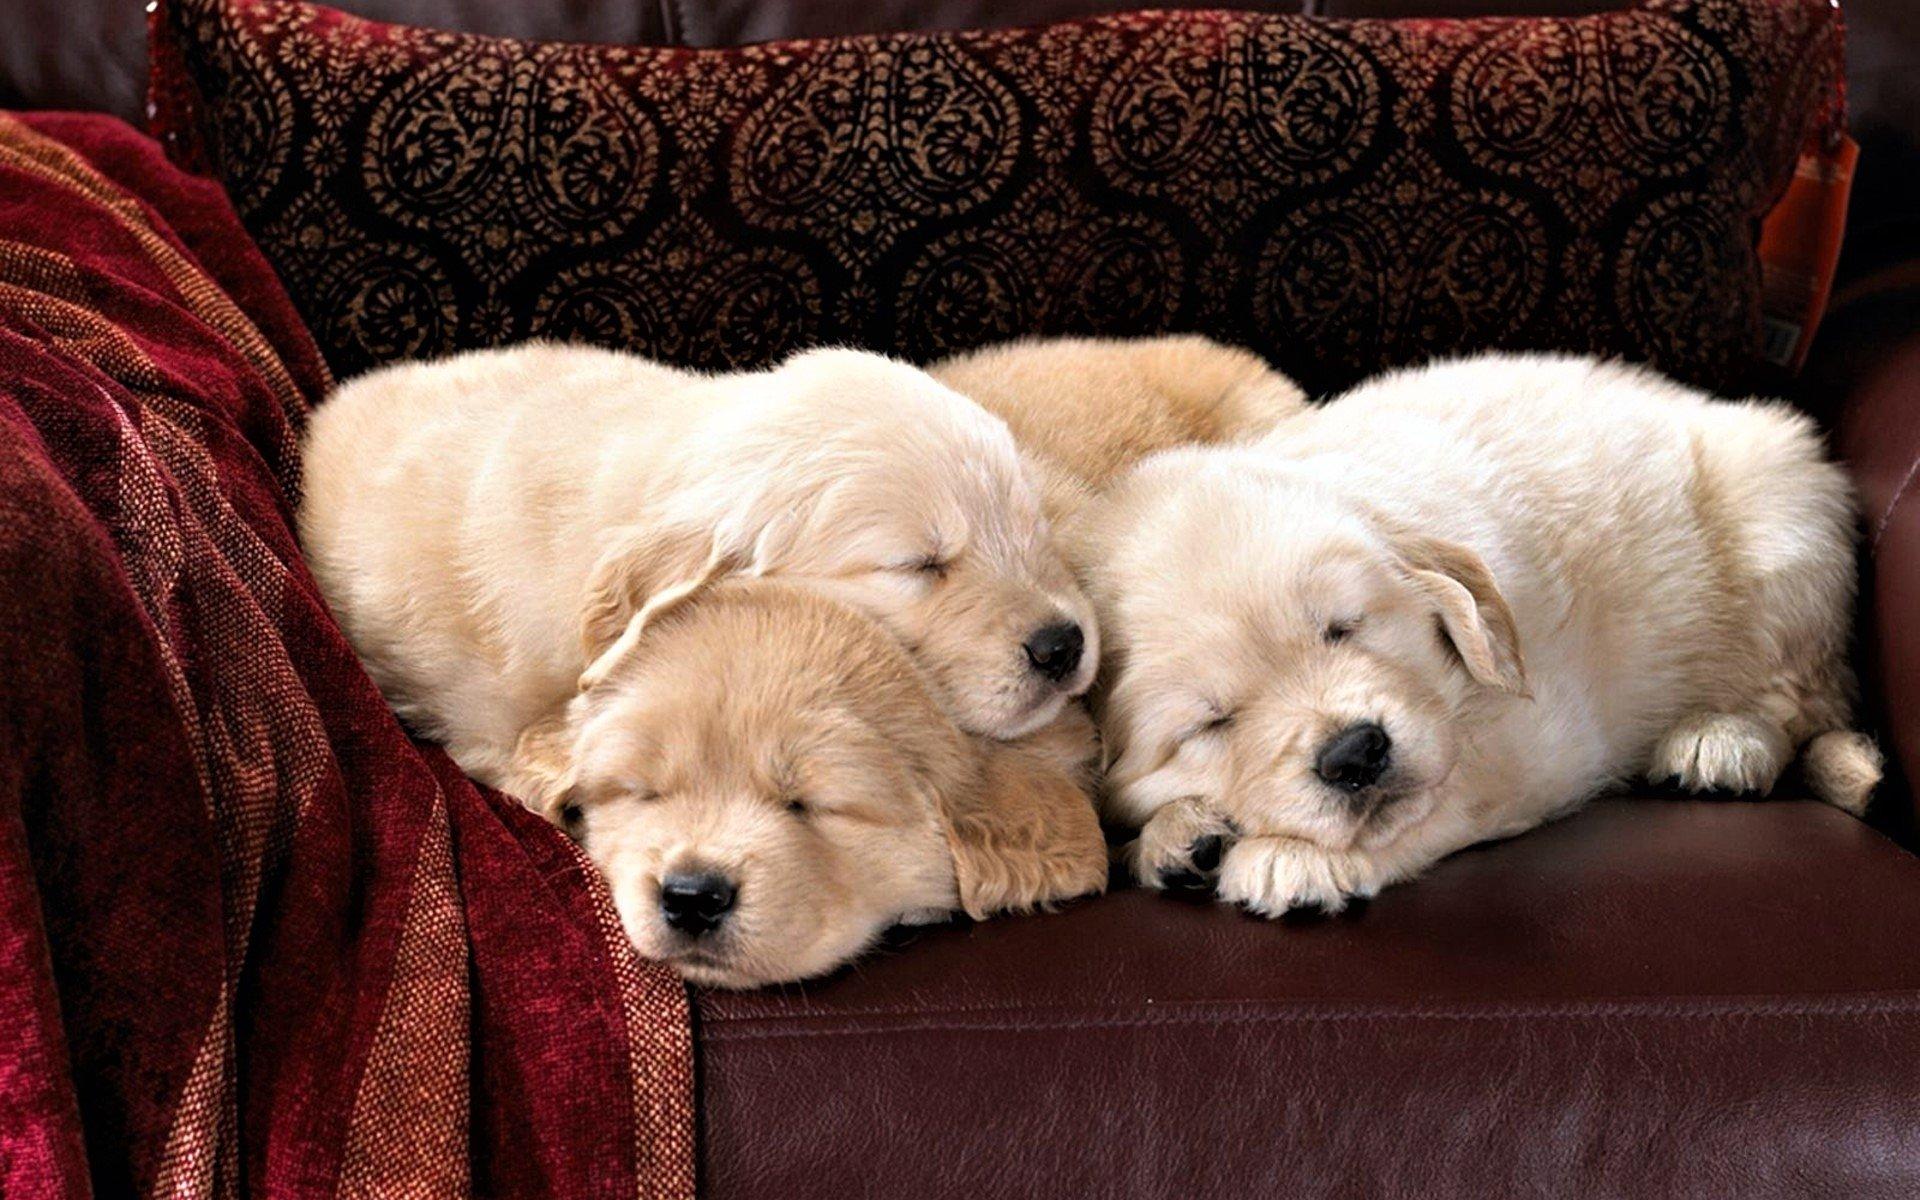 cute sleeping puppies hd wallpaper | background image | 1920x1200